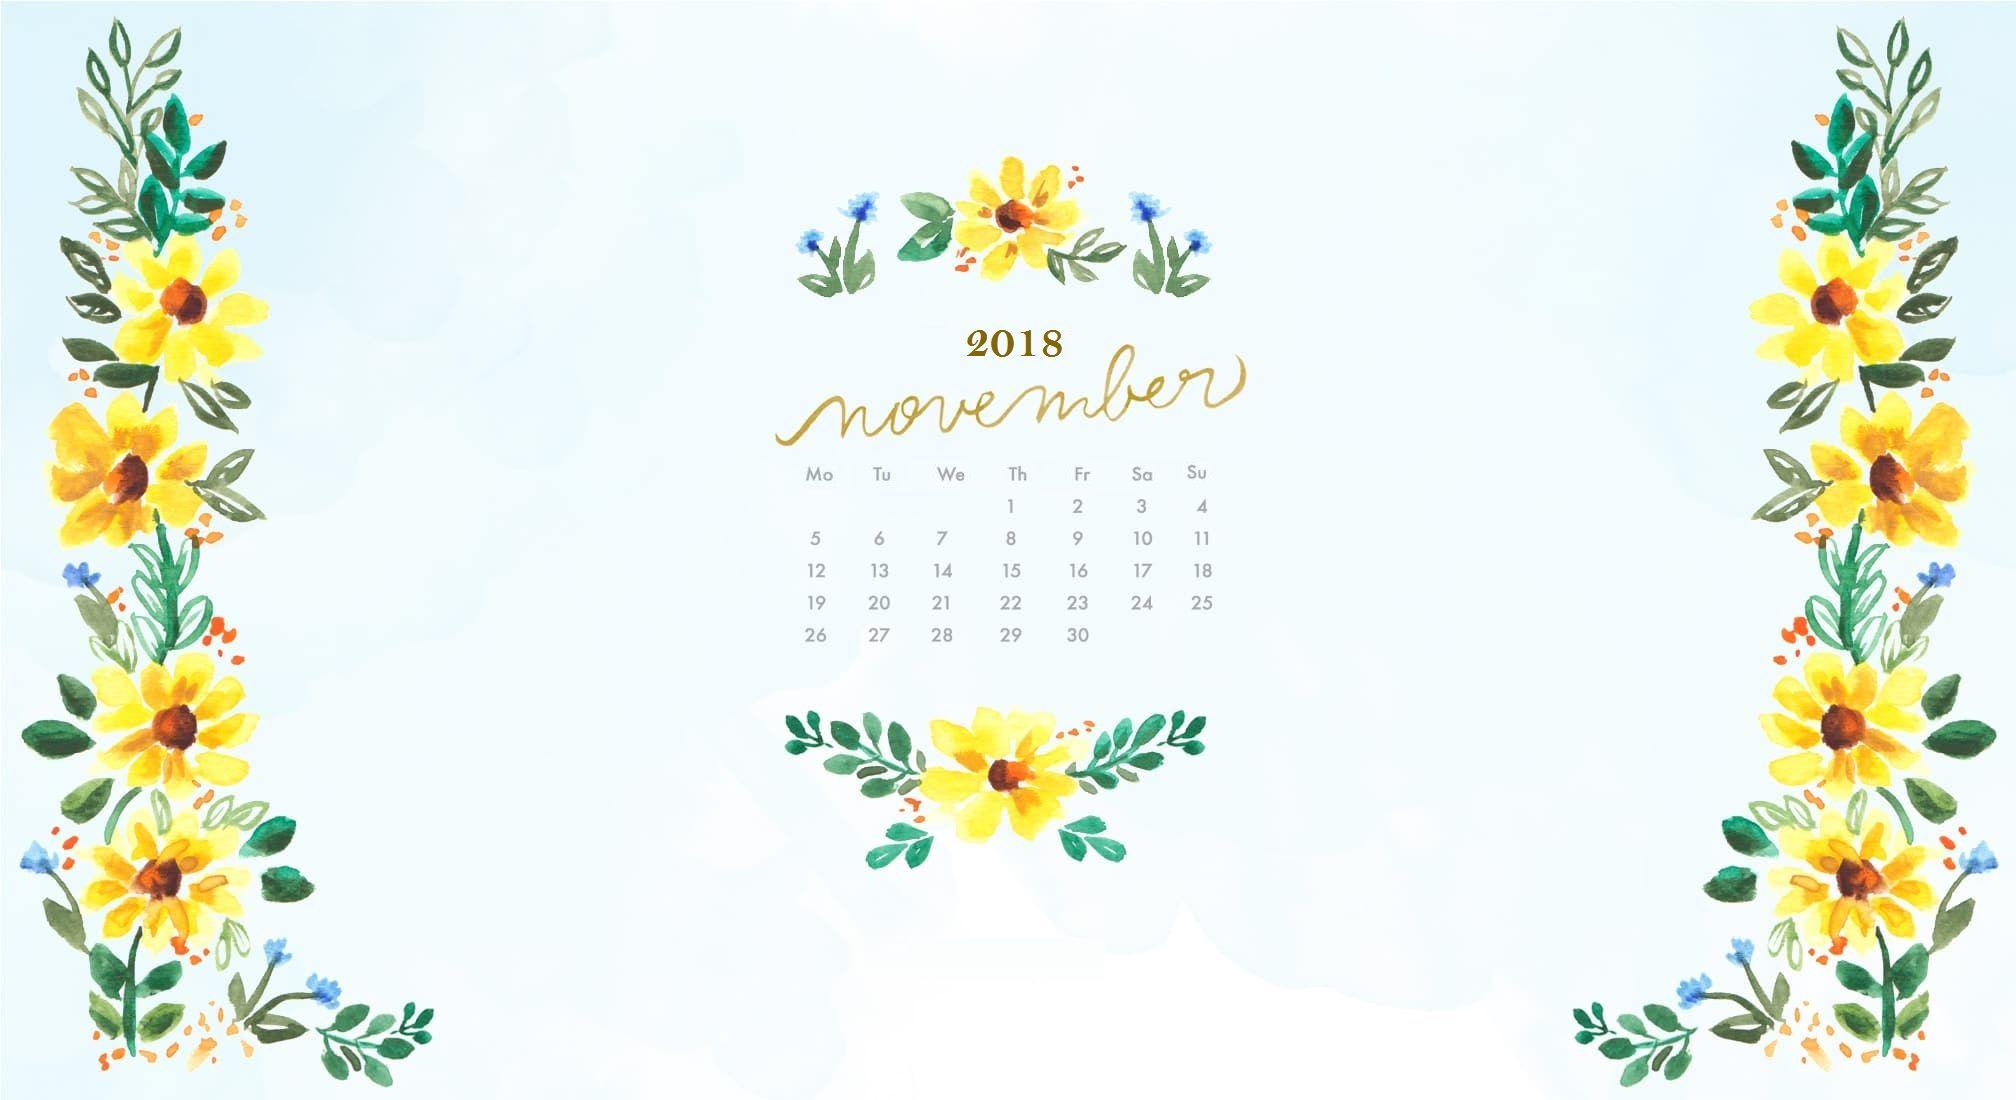 November 2018 Watercolor Calendar Wallpaper Calendar Wallpaper November Wallpaper Wallpaper